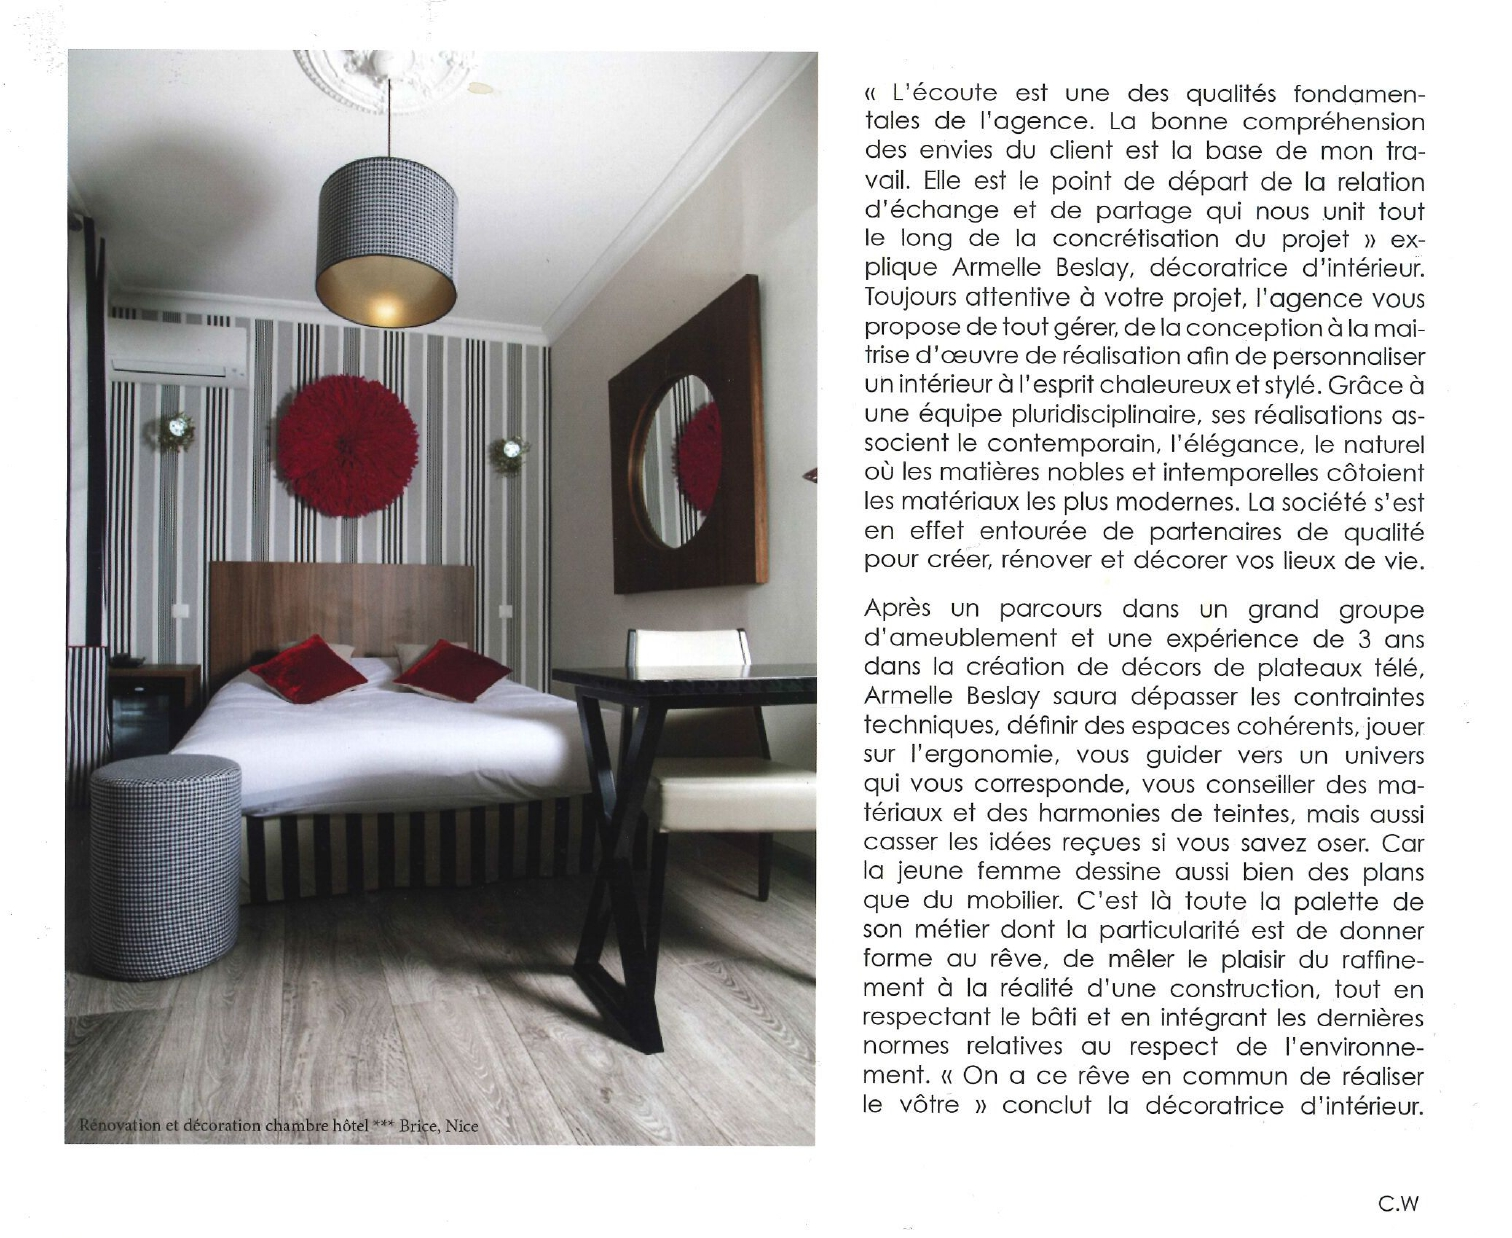 Perspective N°19 - Best Western Plus Hôtel Brice Garden Nice